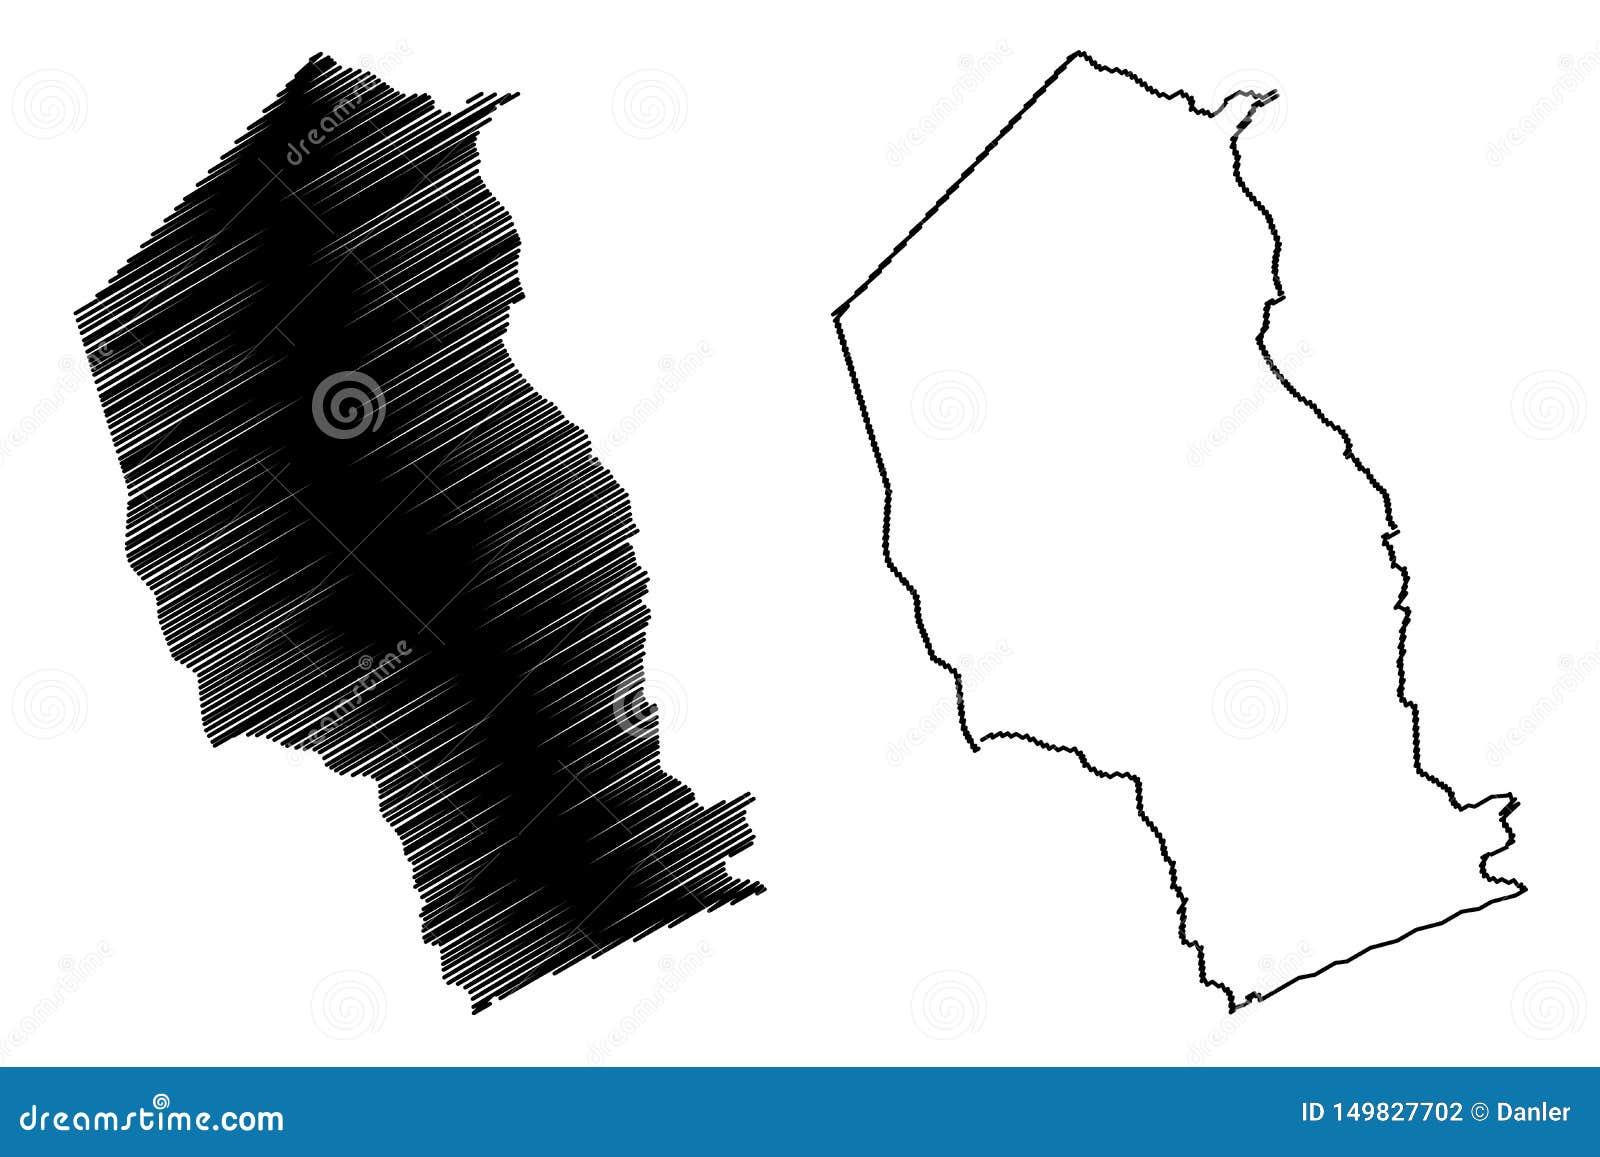 Gaza Province Provinces of Mozambique, Republic of Mozambique map vector illustration, scribble sketch Gaza map